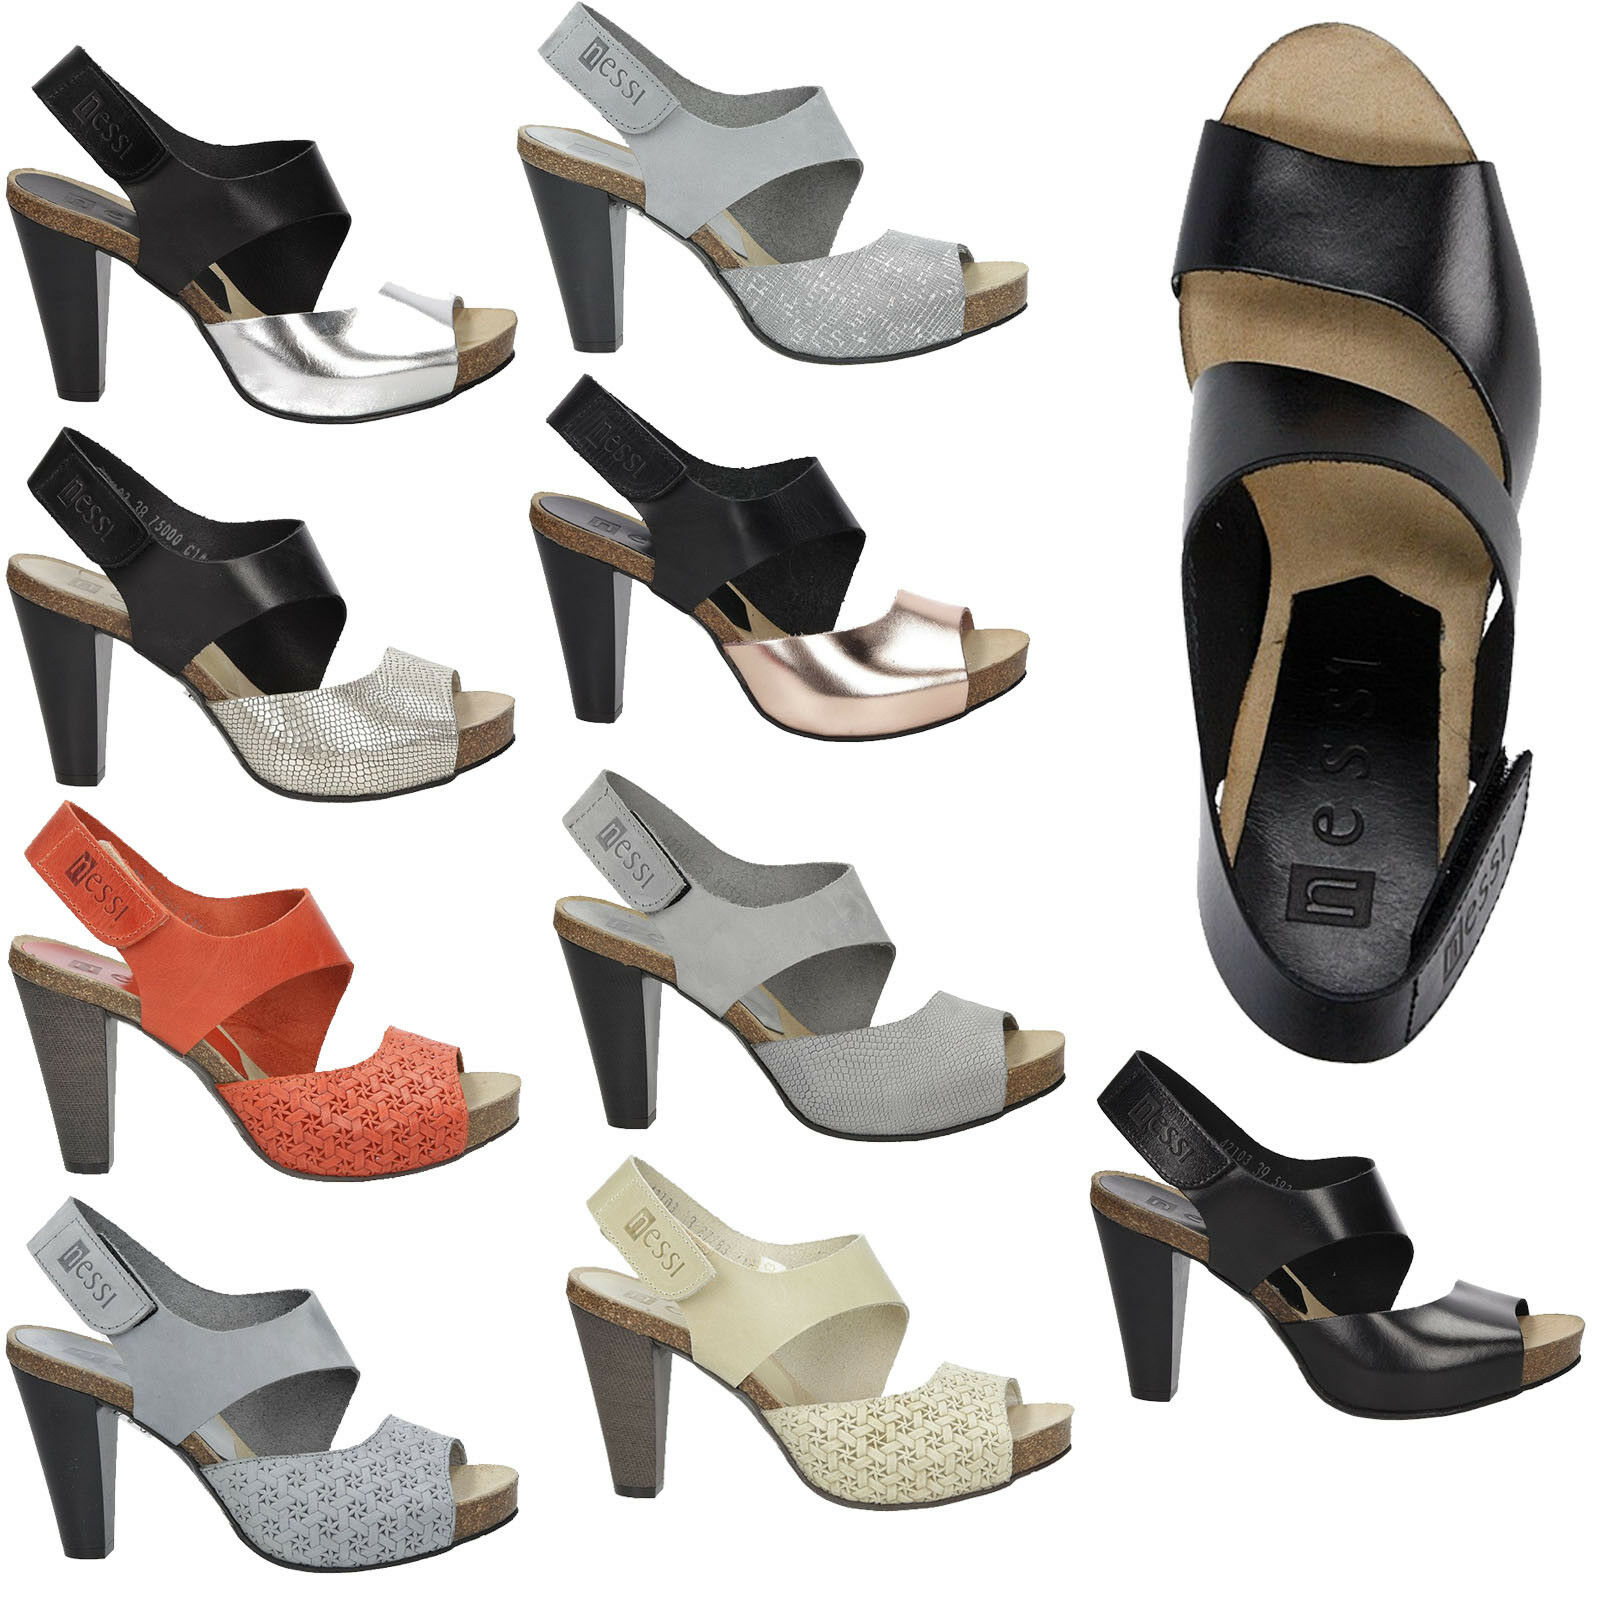 Femmes Sandales TAFF Velcro Talon Bloc ELEGANT Taille 36-40 Neuf